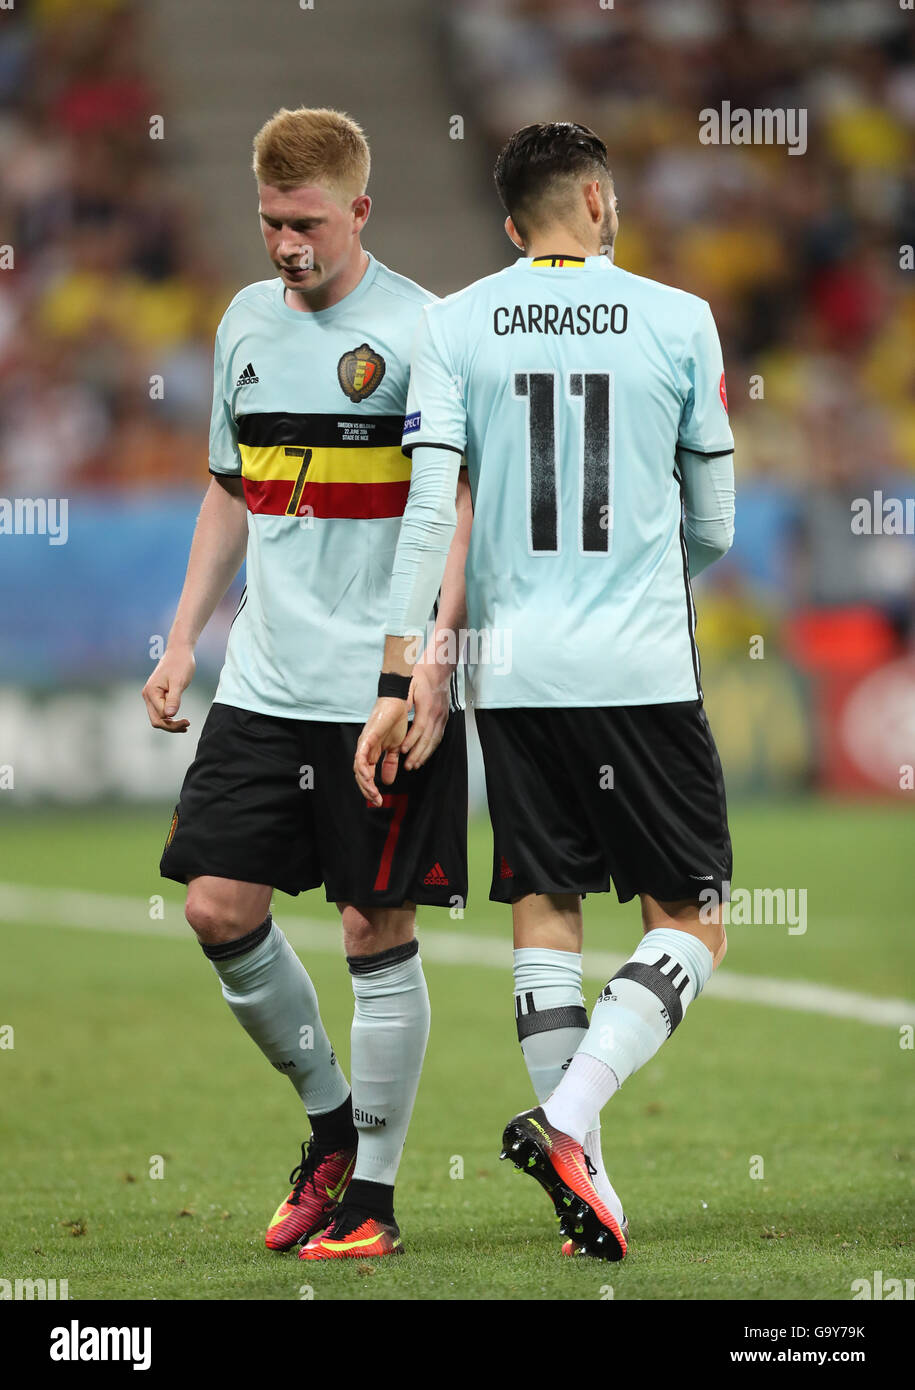 Kevin De Bruyne L and Yannick Carrasco of Belgium during UEFA